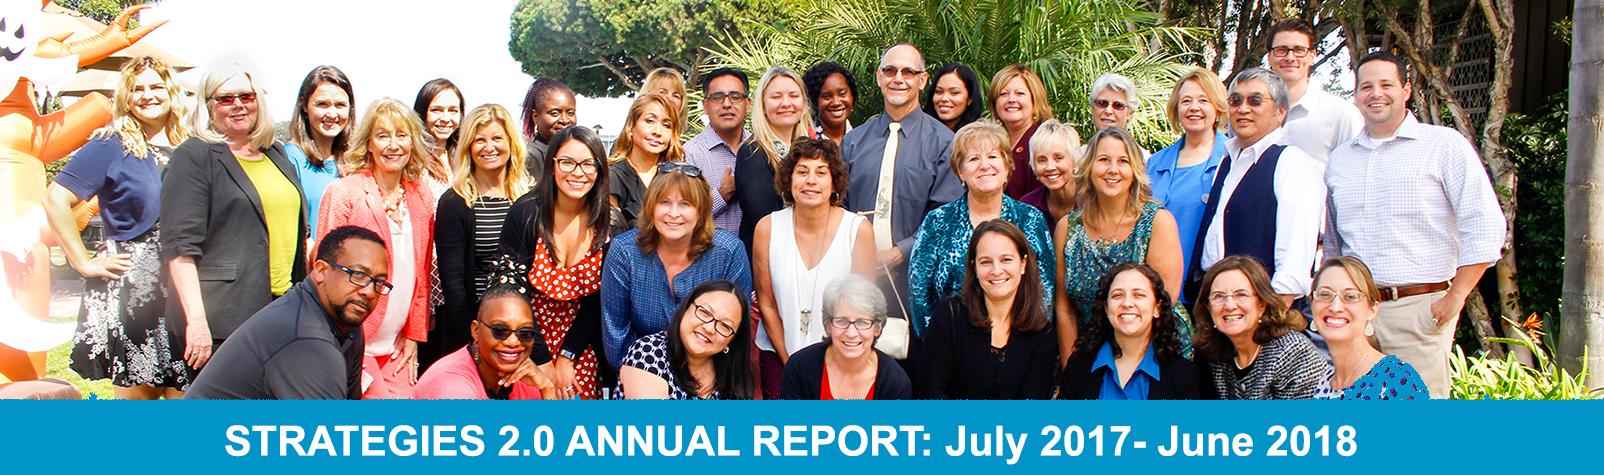 Strategies 2.0 Annual Report